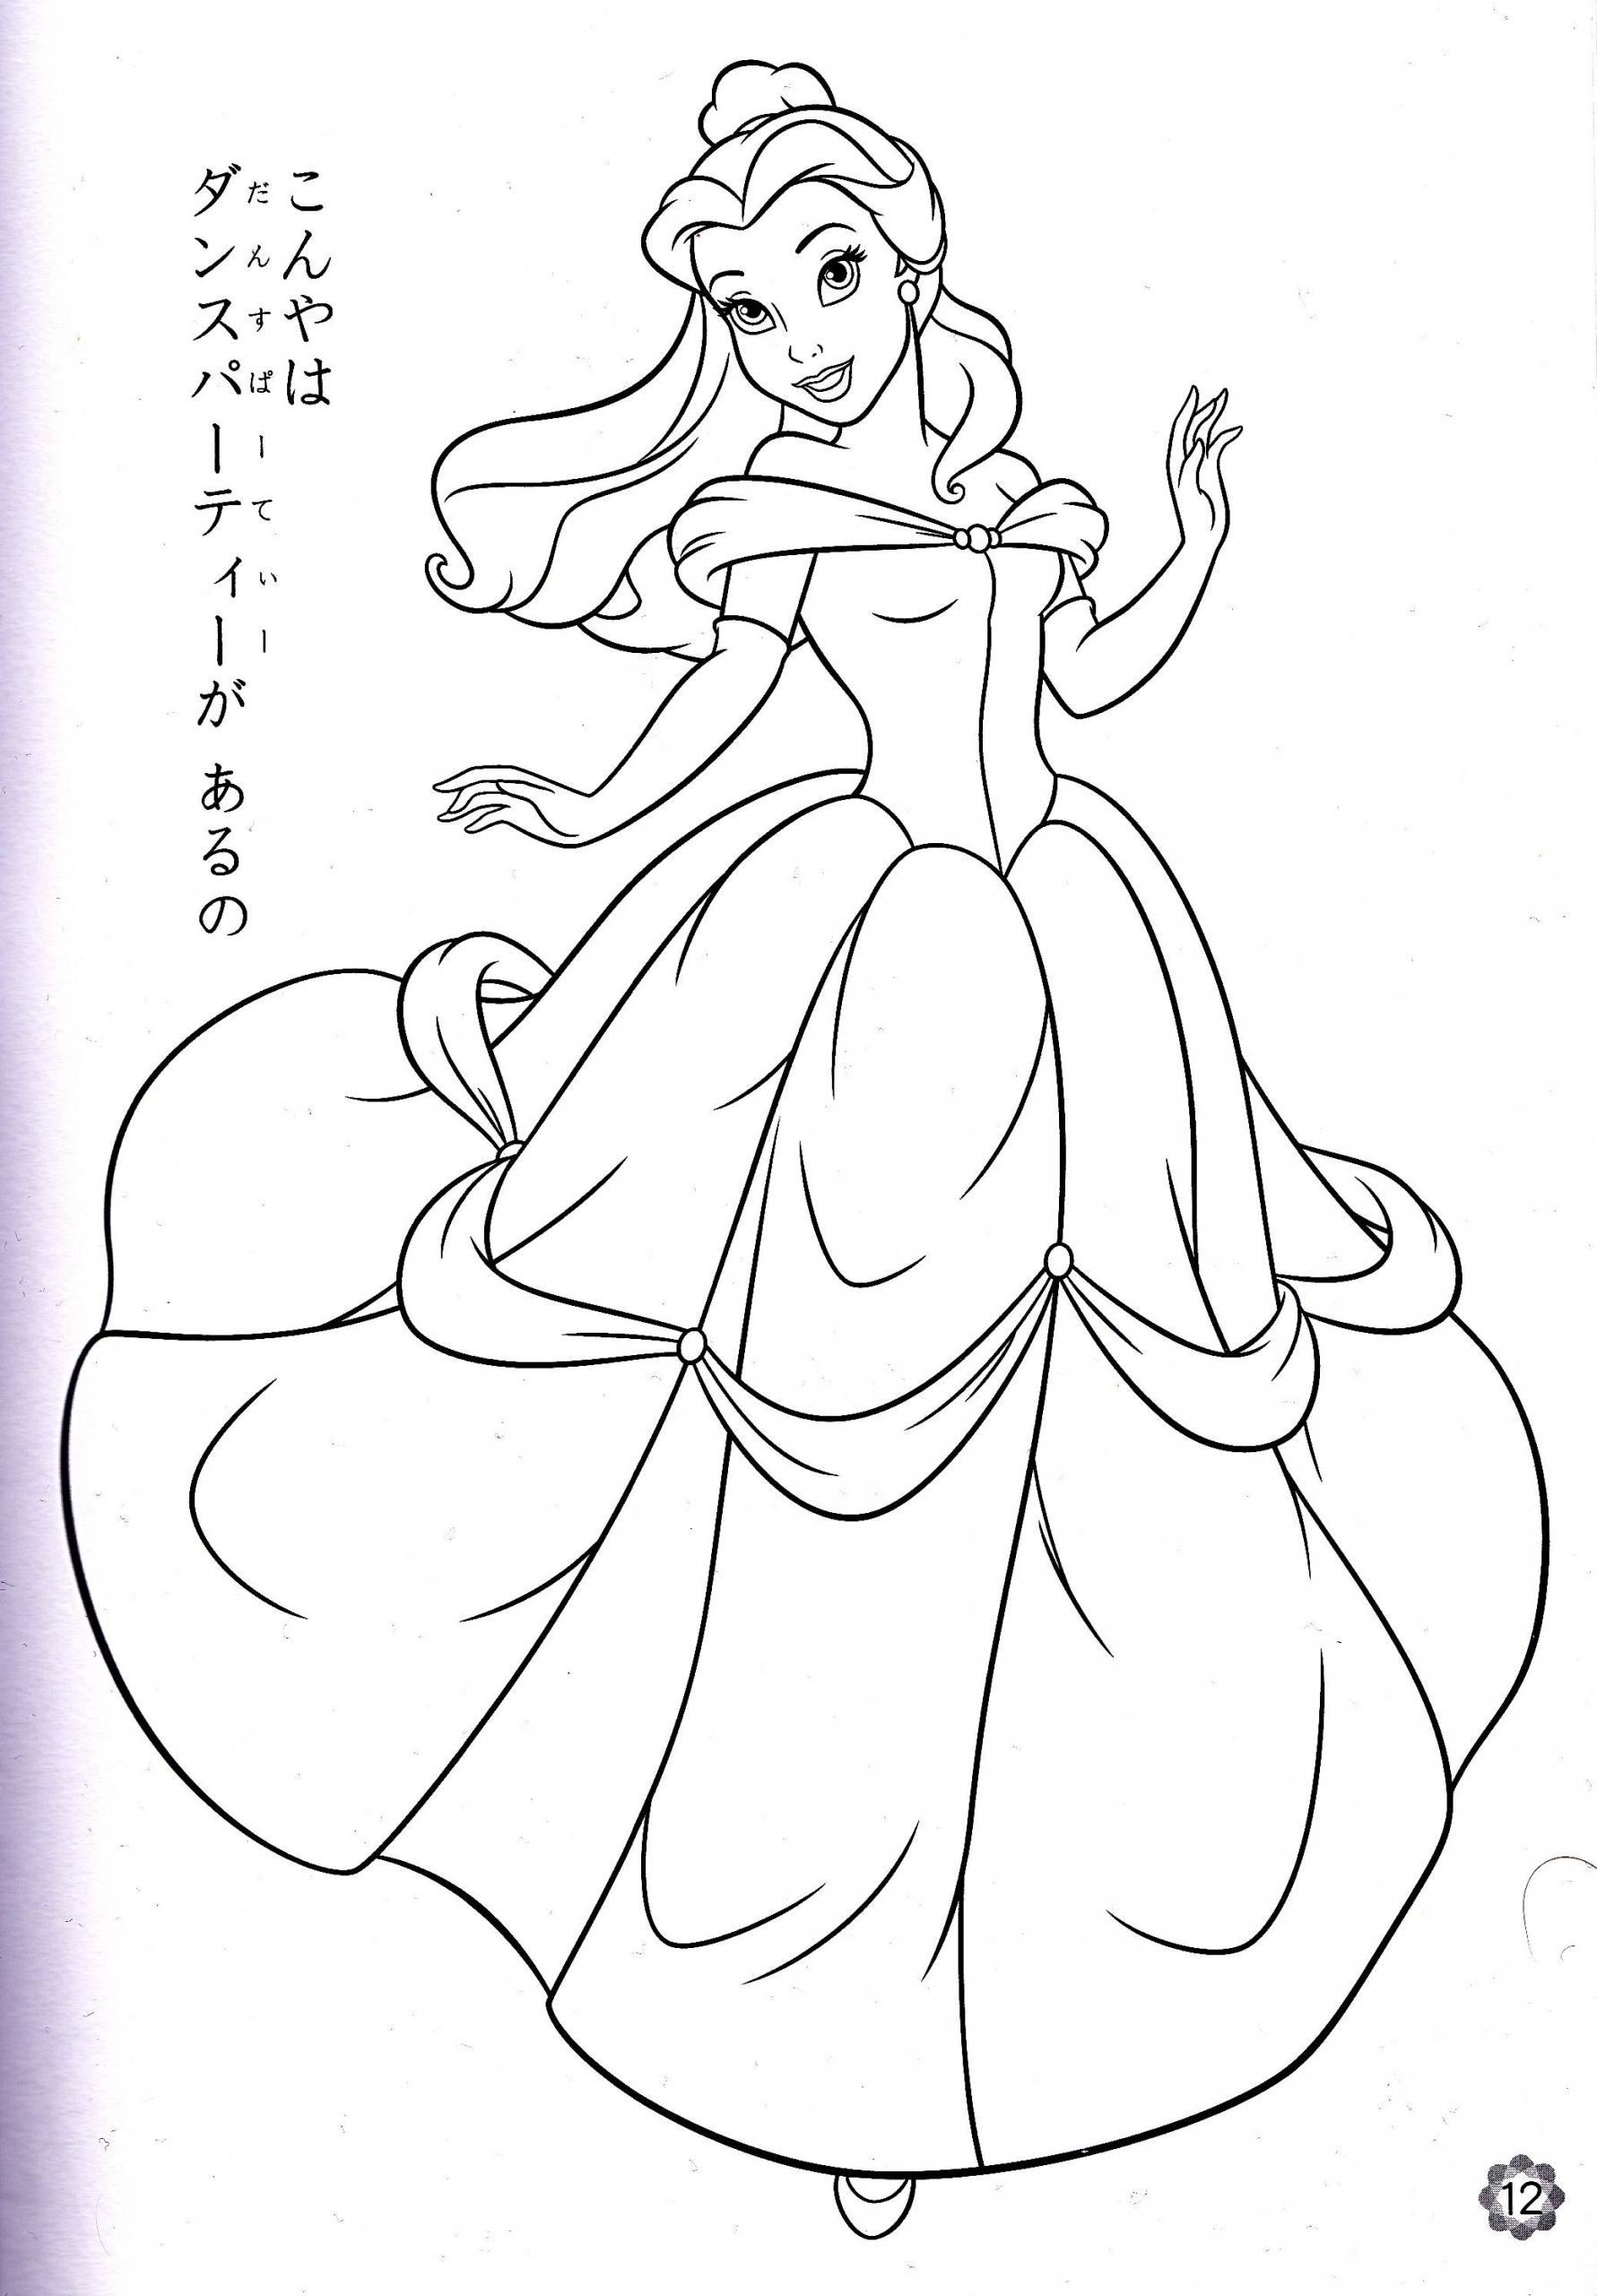 Belle Princess Coloring Page - youngandtae.com  Disney princess